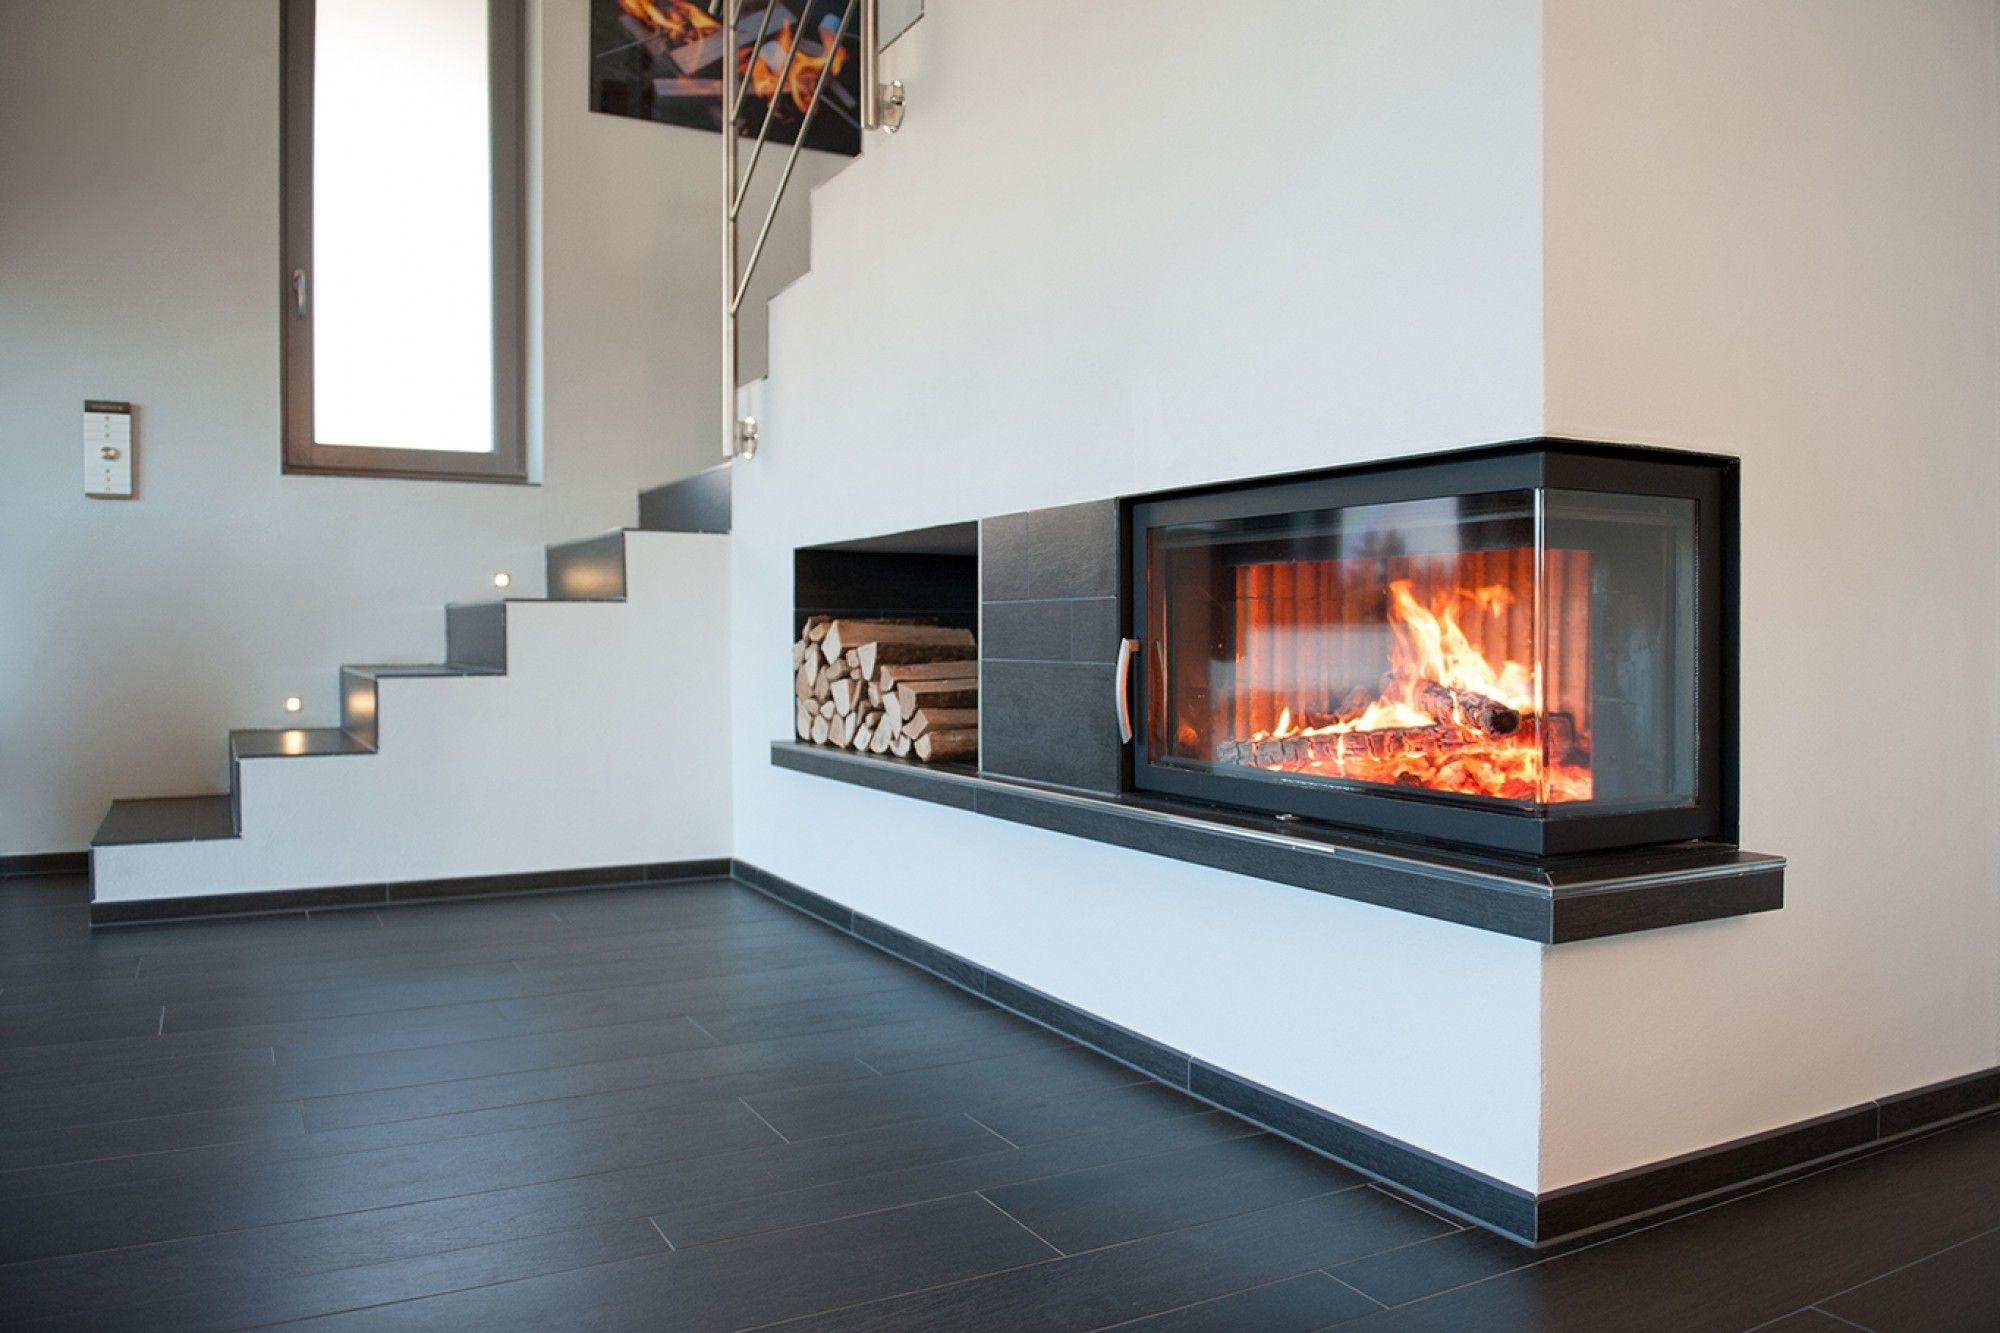 Galerie axel götze u ofenbau ideen aus plauen homeroom